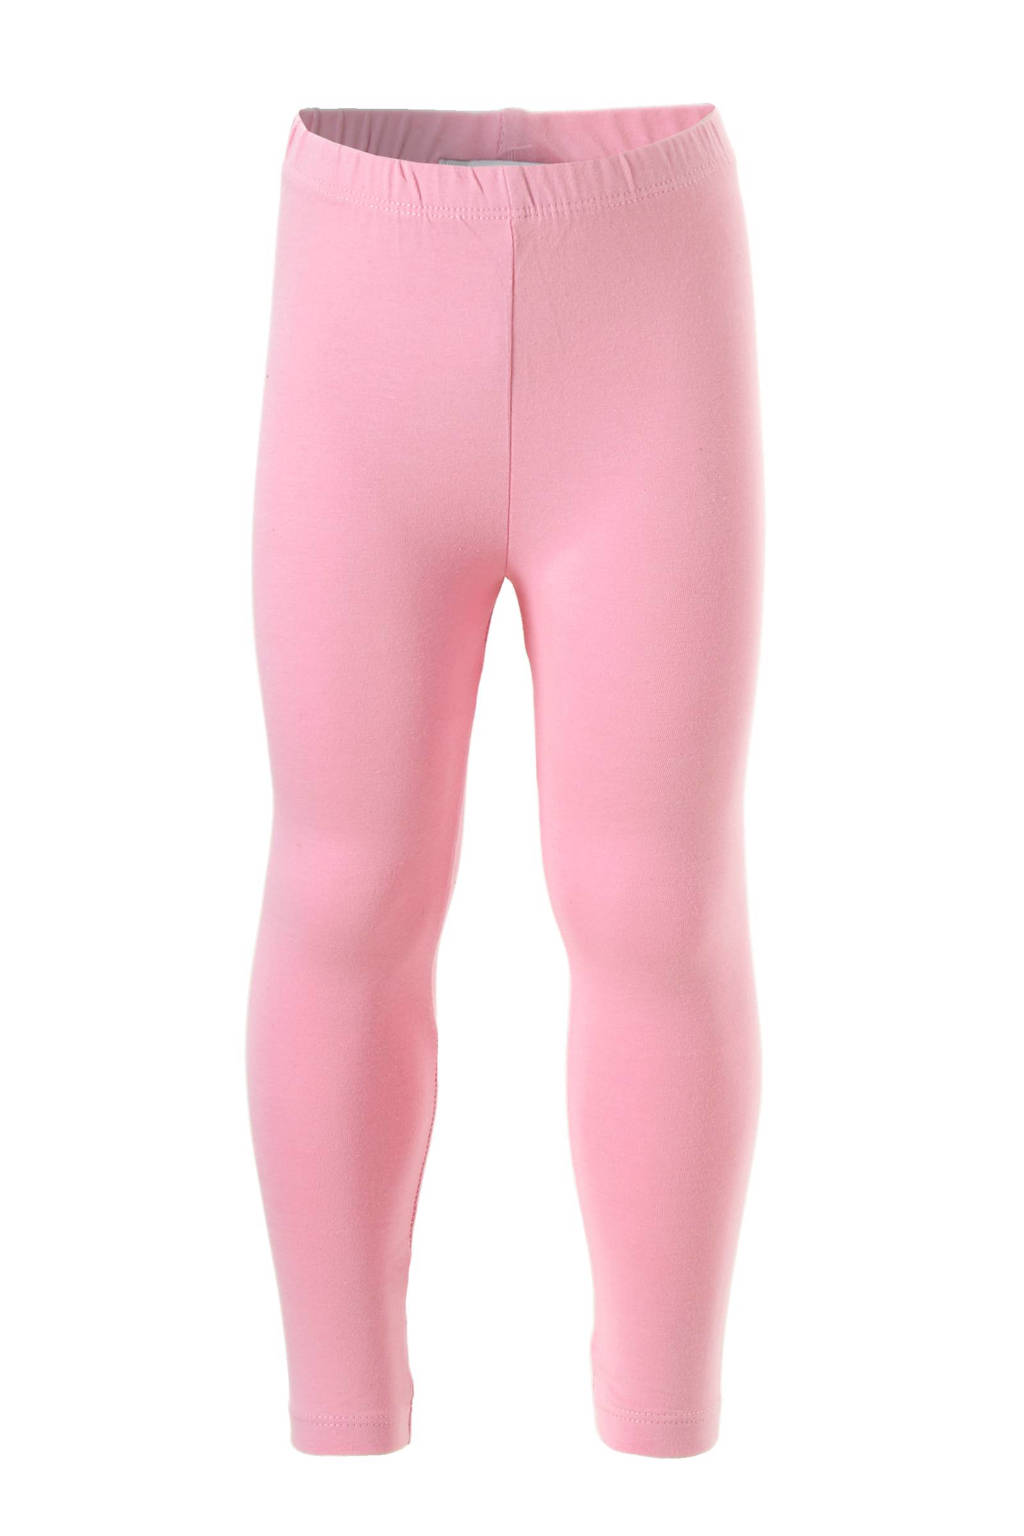 Noppies legging roze, Roze